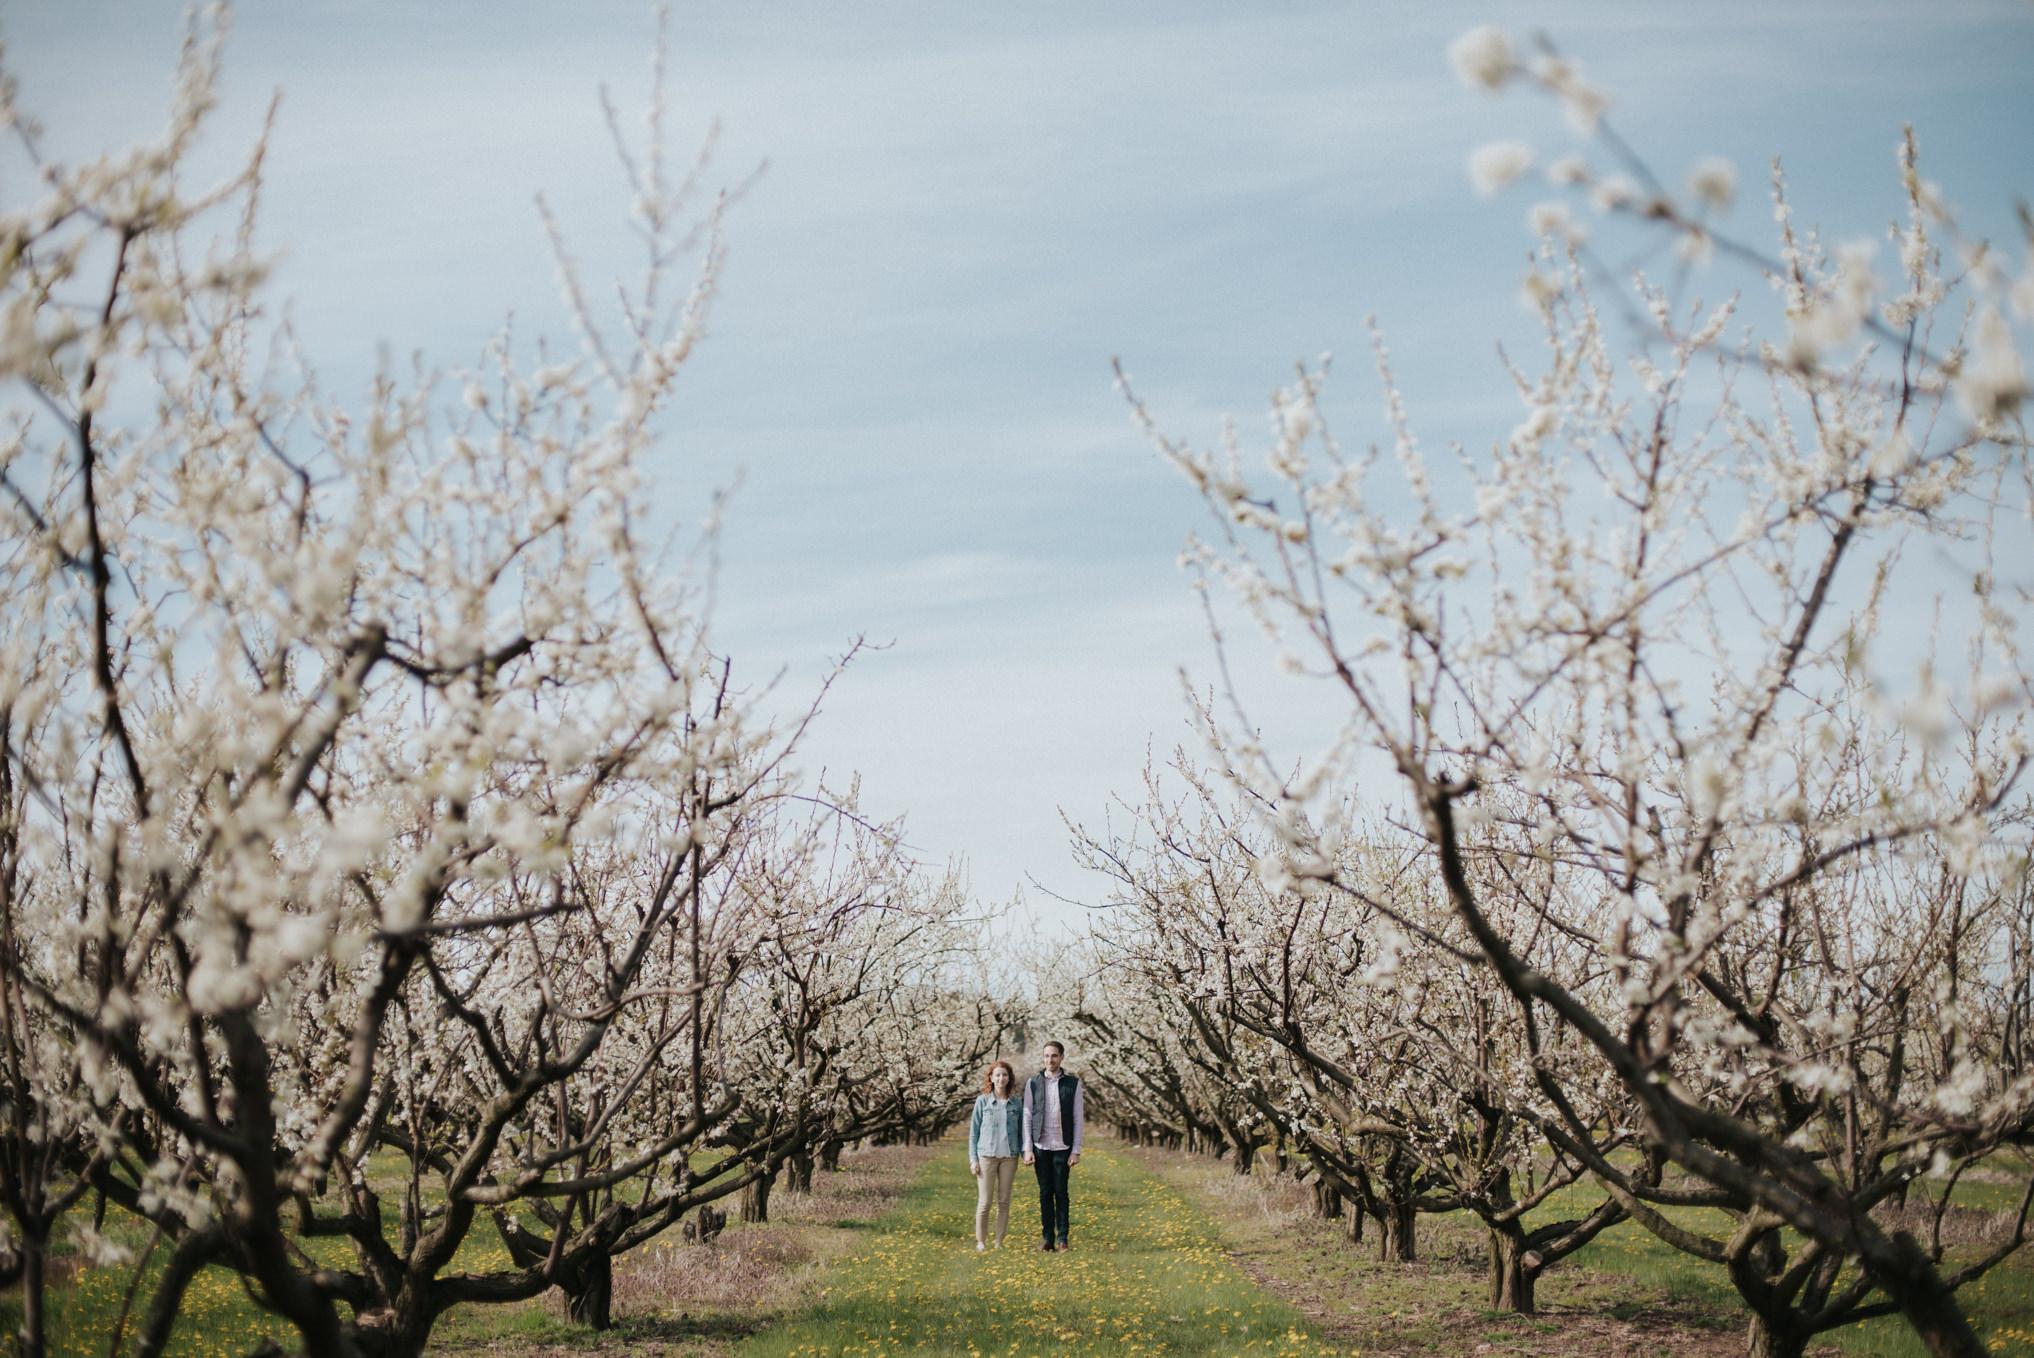 Spring bloom orchard engagement shoot by Daring Wanderer // www.daringwanderer.com